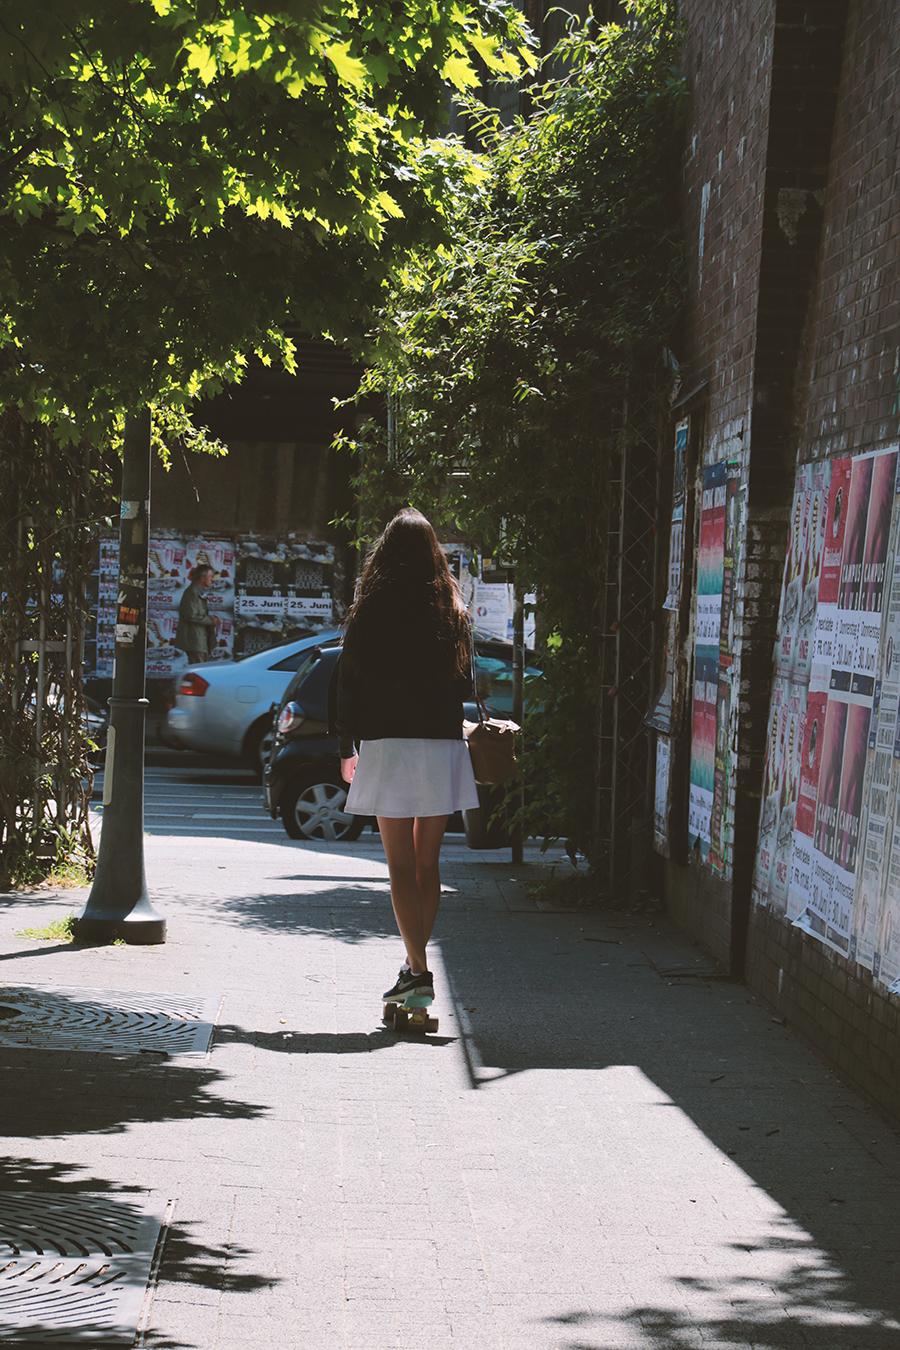 mädchen-skateboard